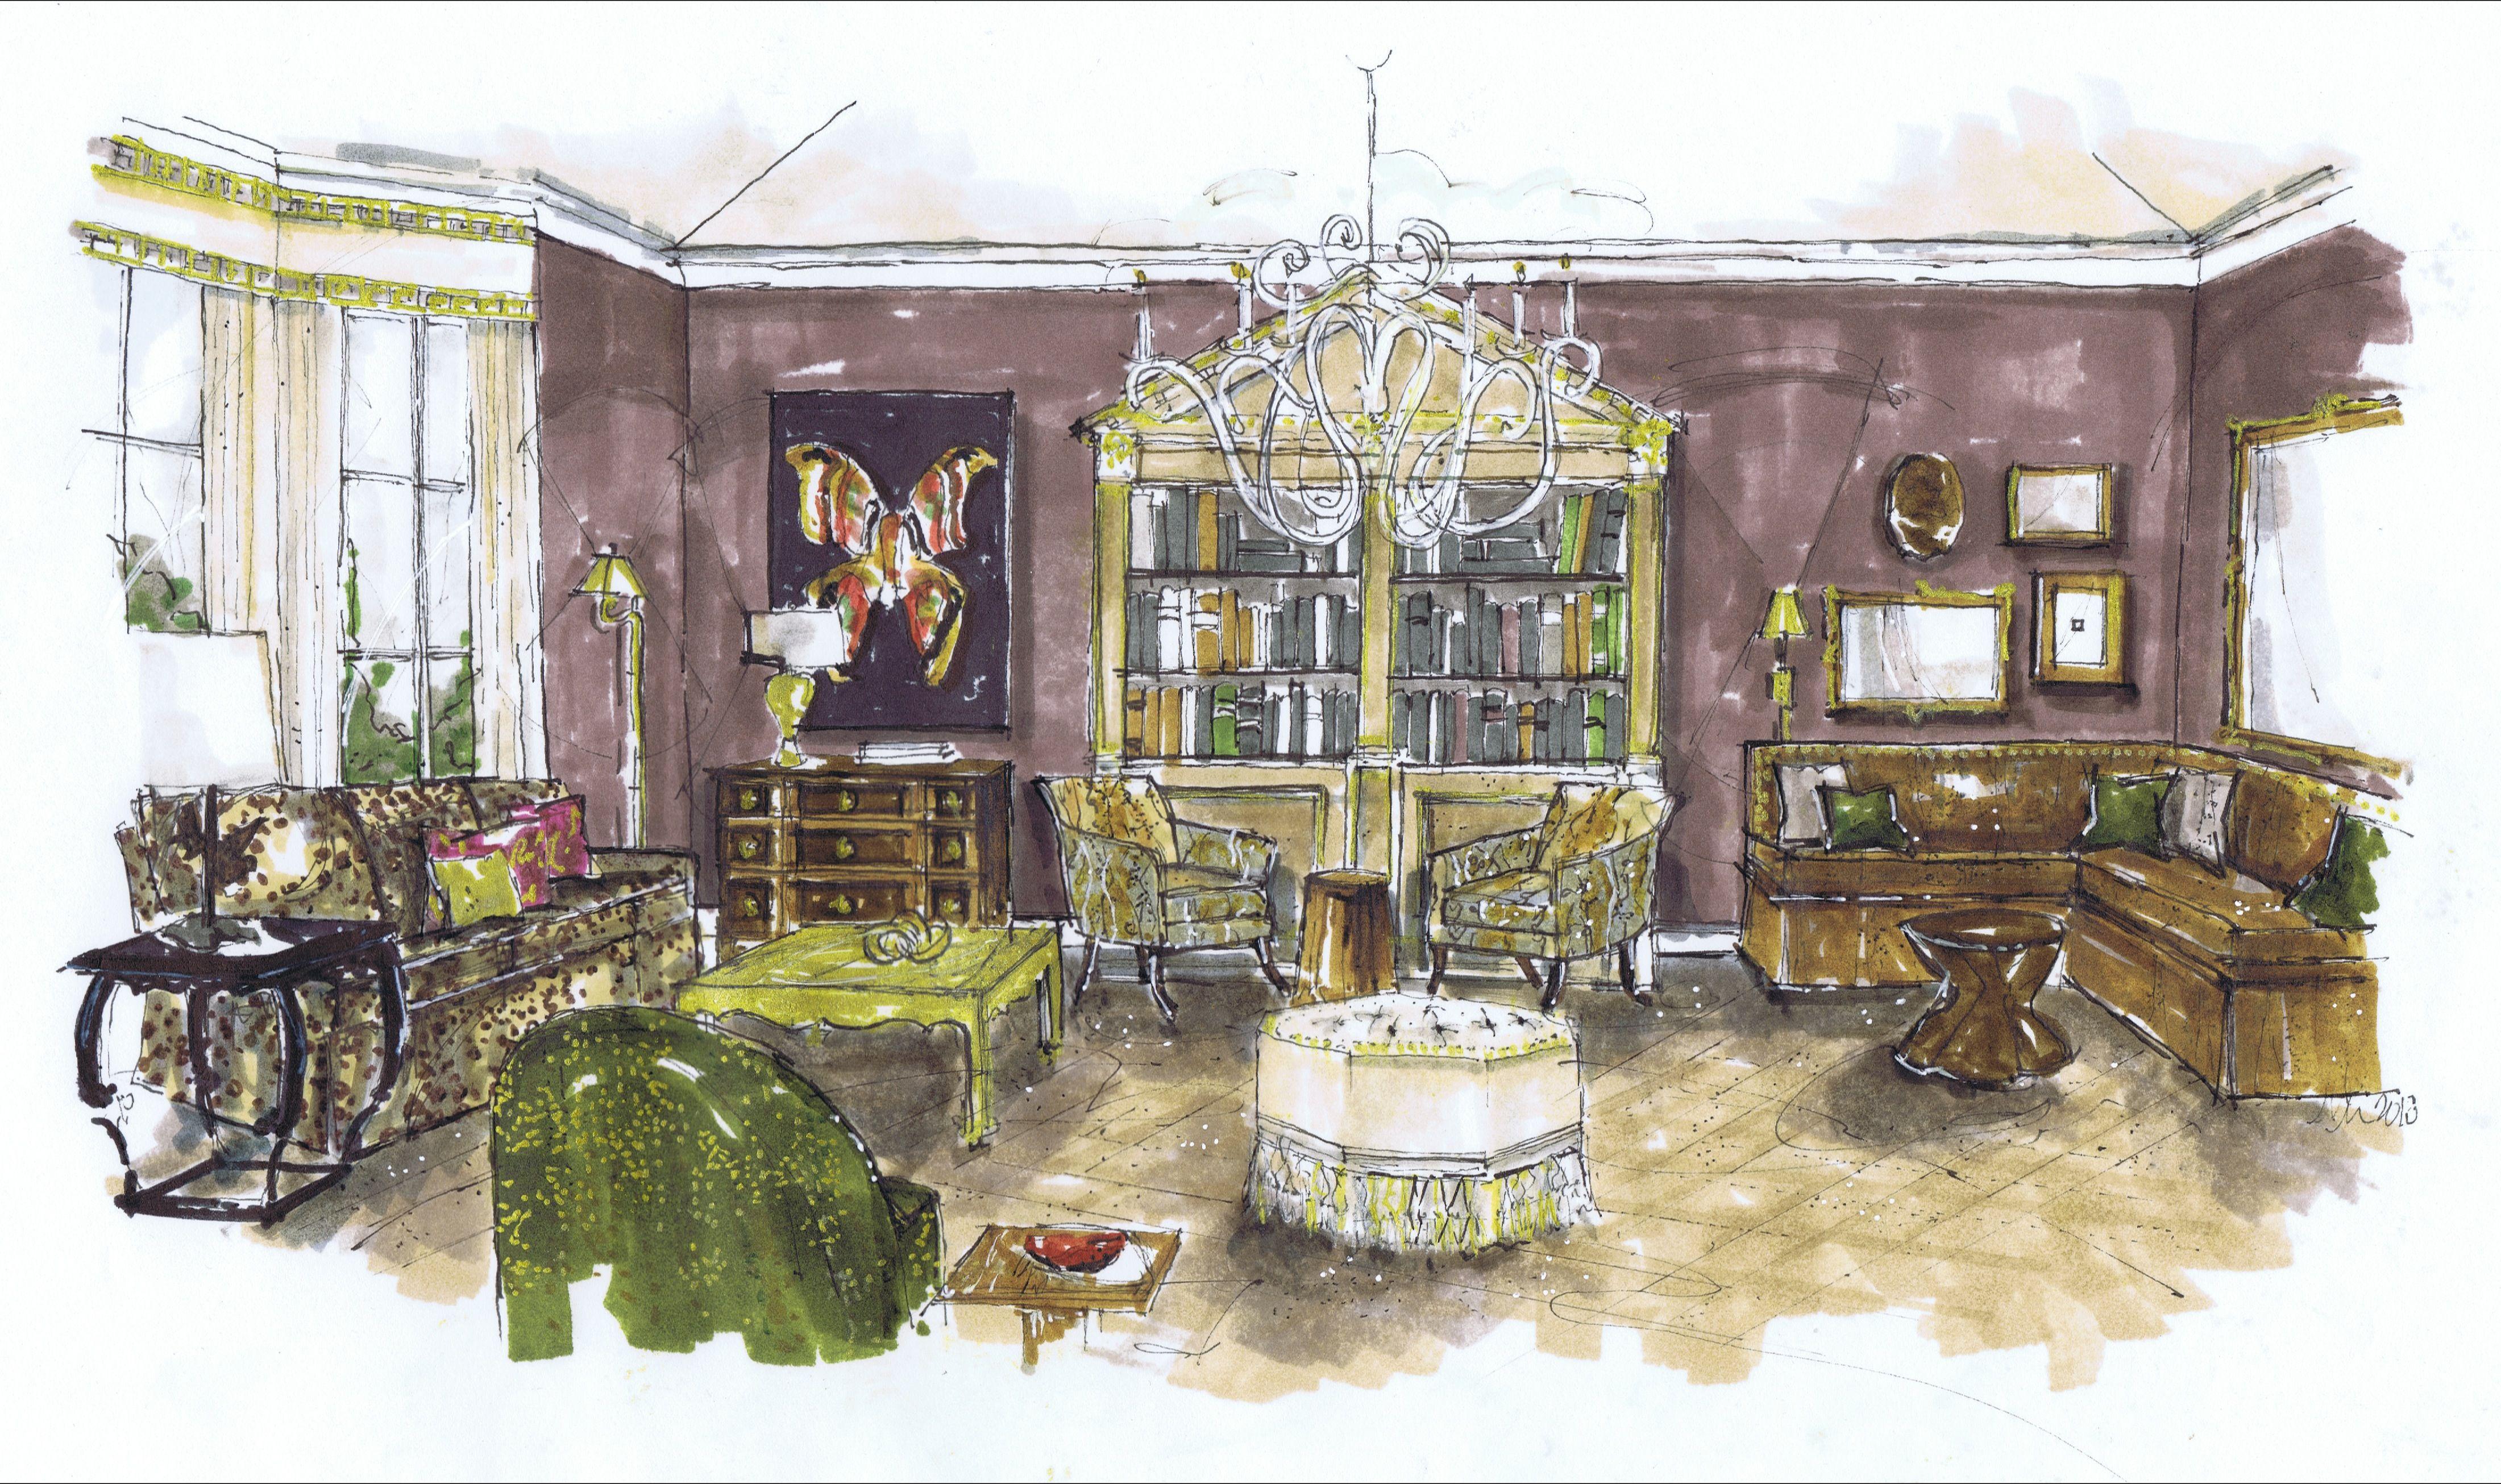 Exterior: House Beautiful Instant Room, October 2012, MMR (Melissa